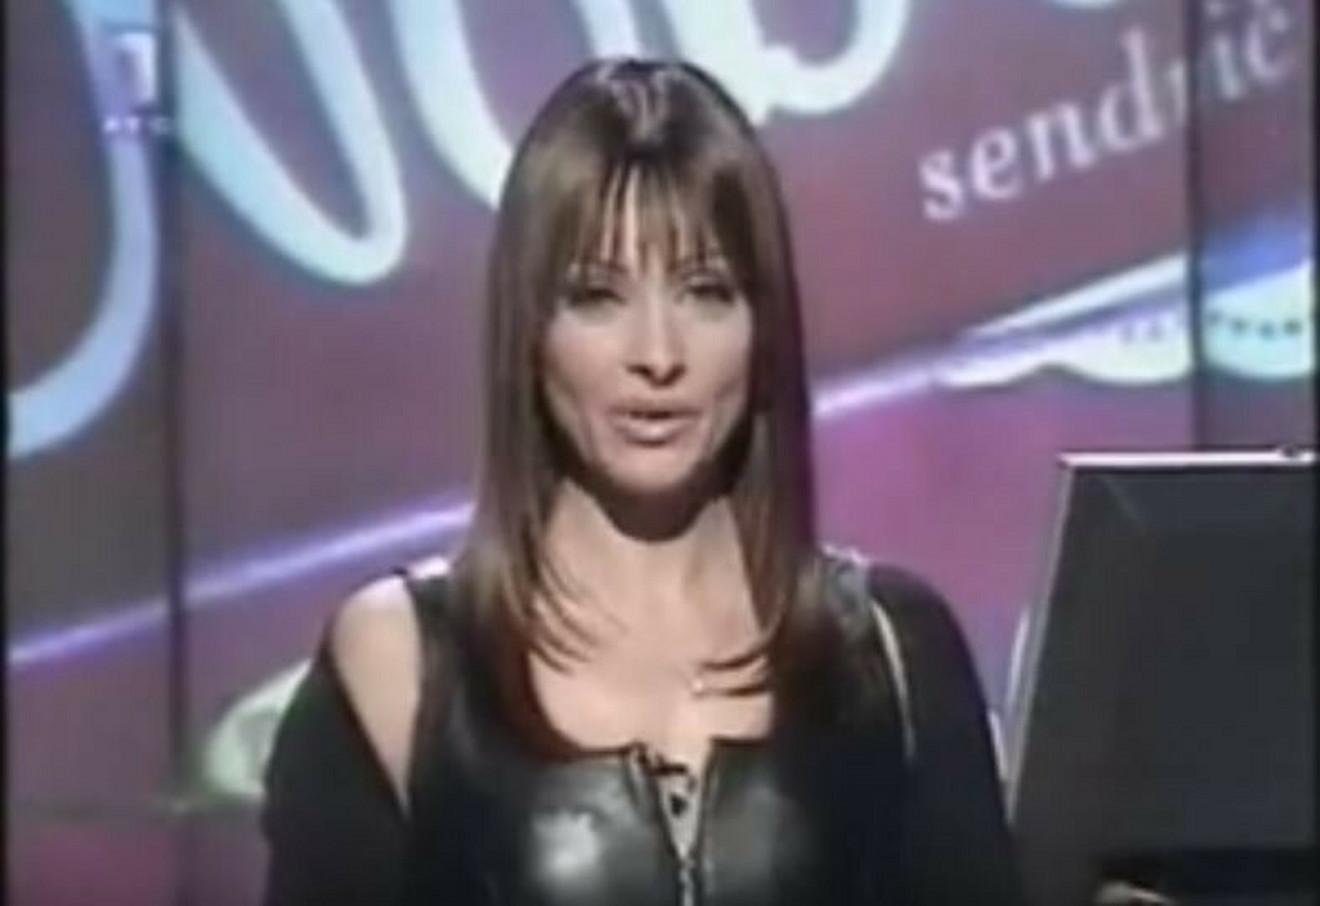 Nataša Nešković